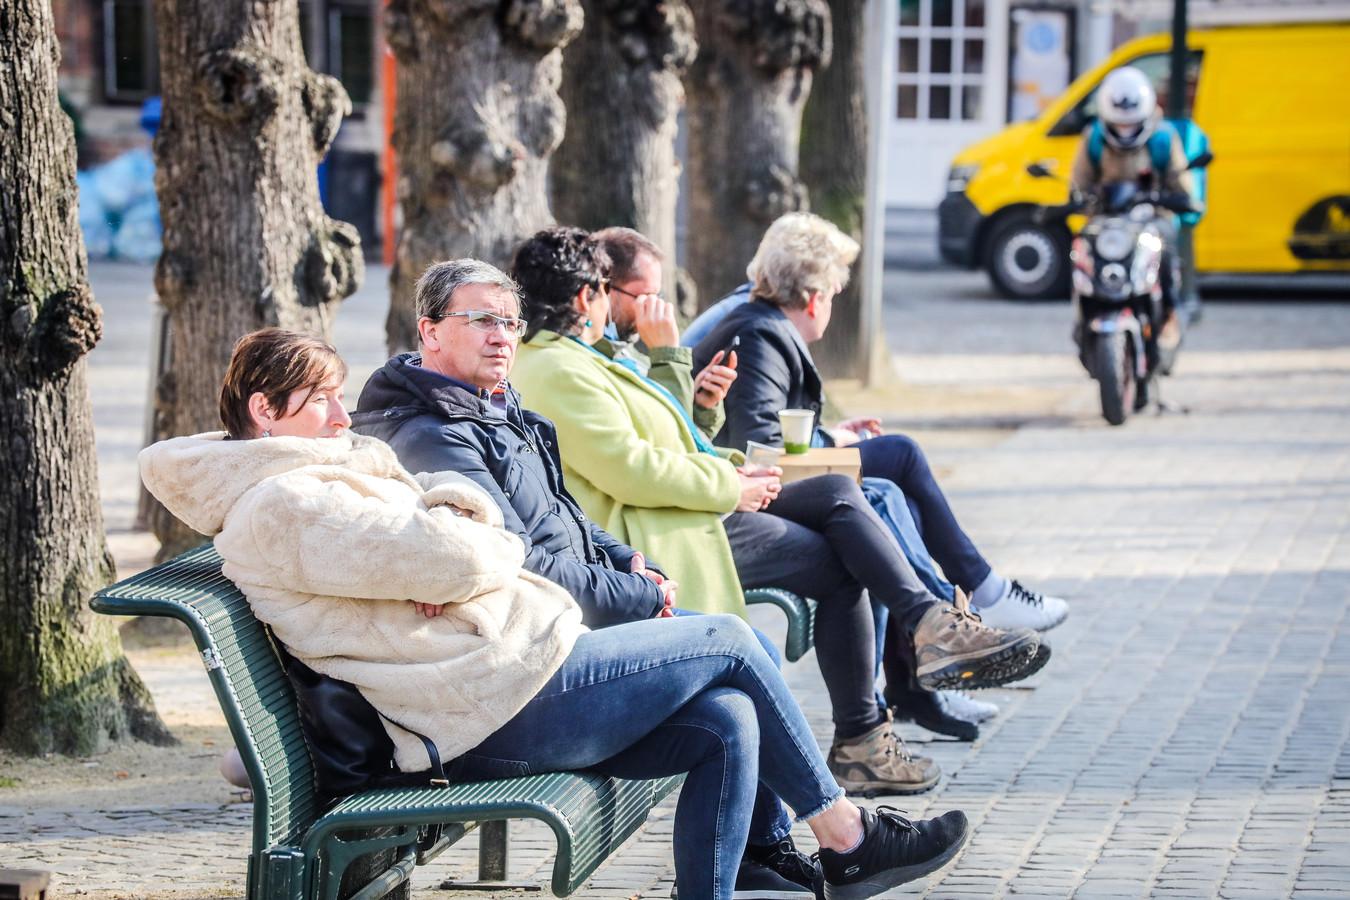 de voorlopig laatste lentedag te Brugge